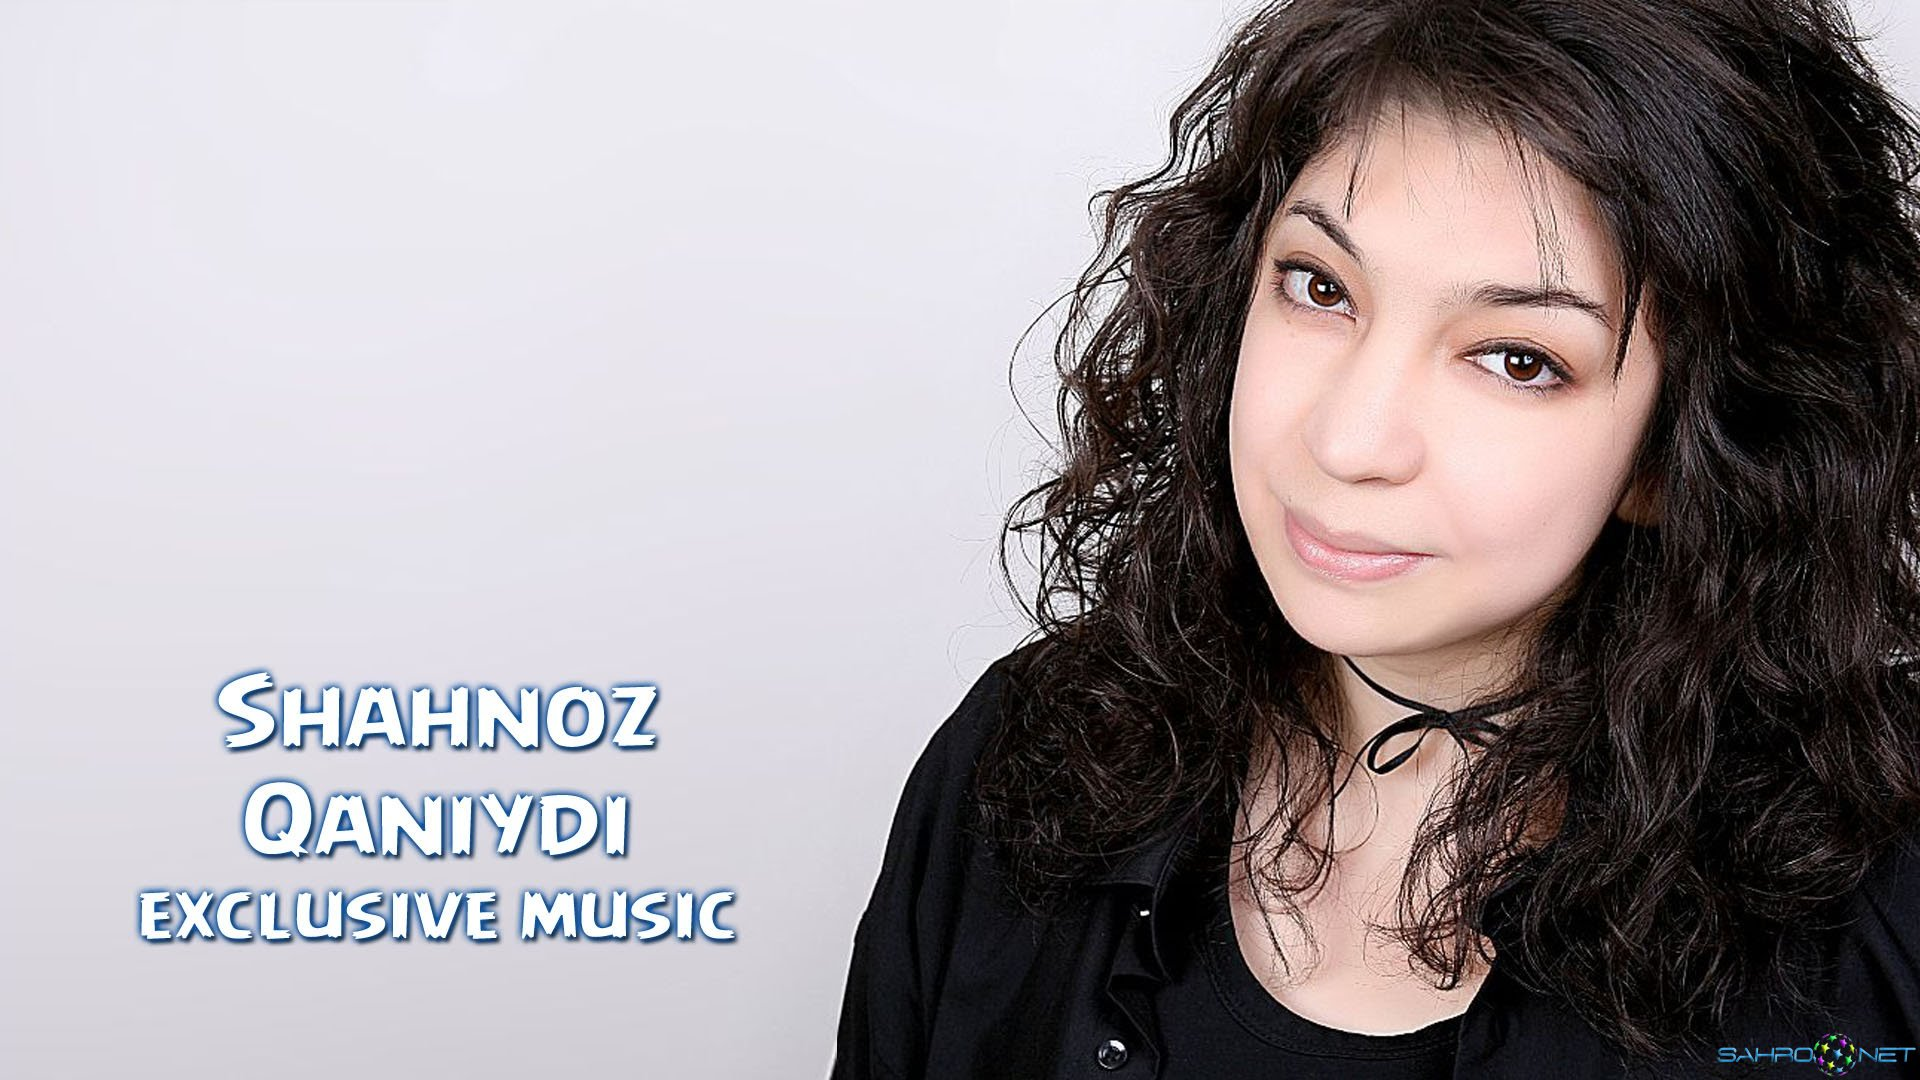 Shahnoz - Qaniydi Янги MP3 Узбек Скачать 2015